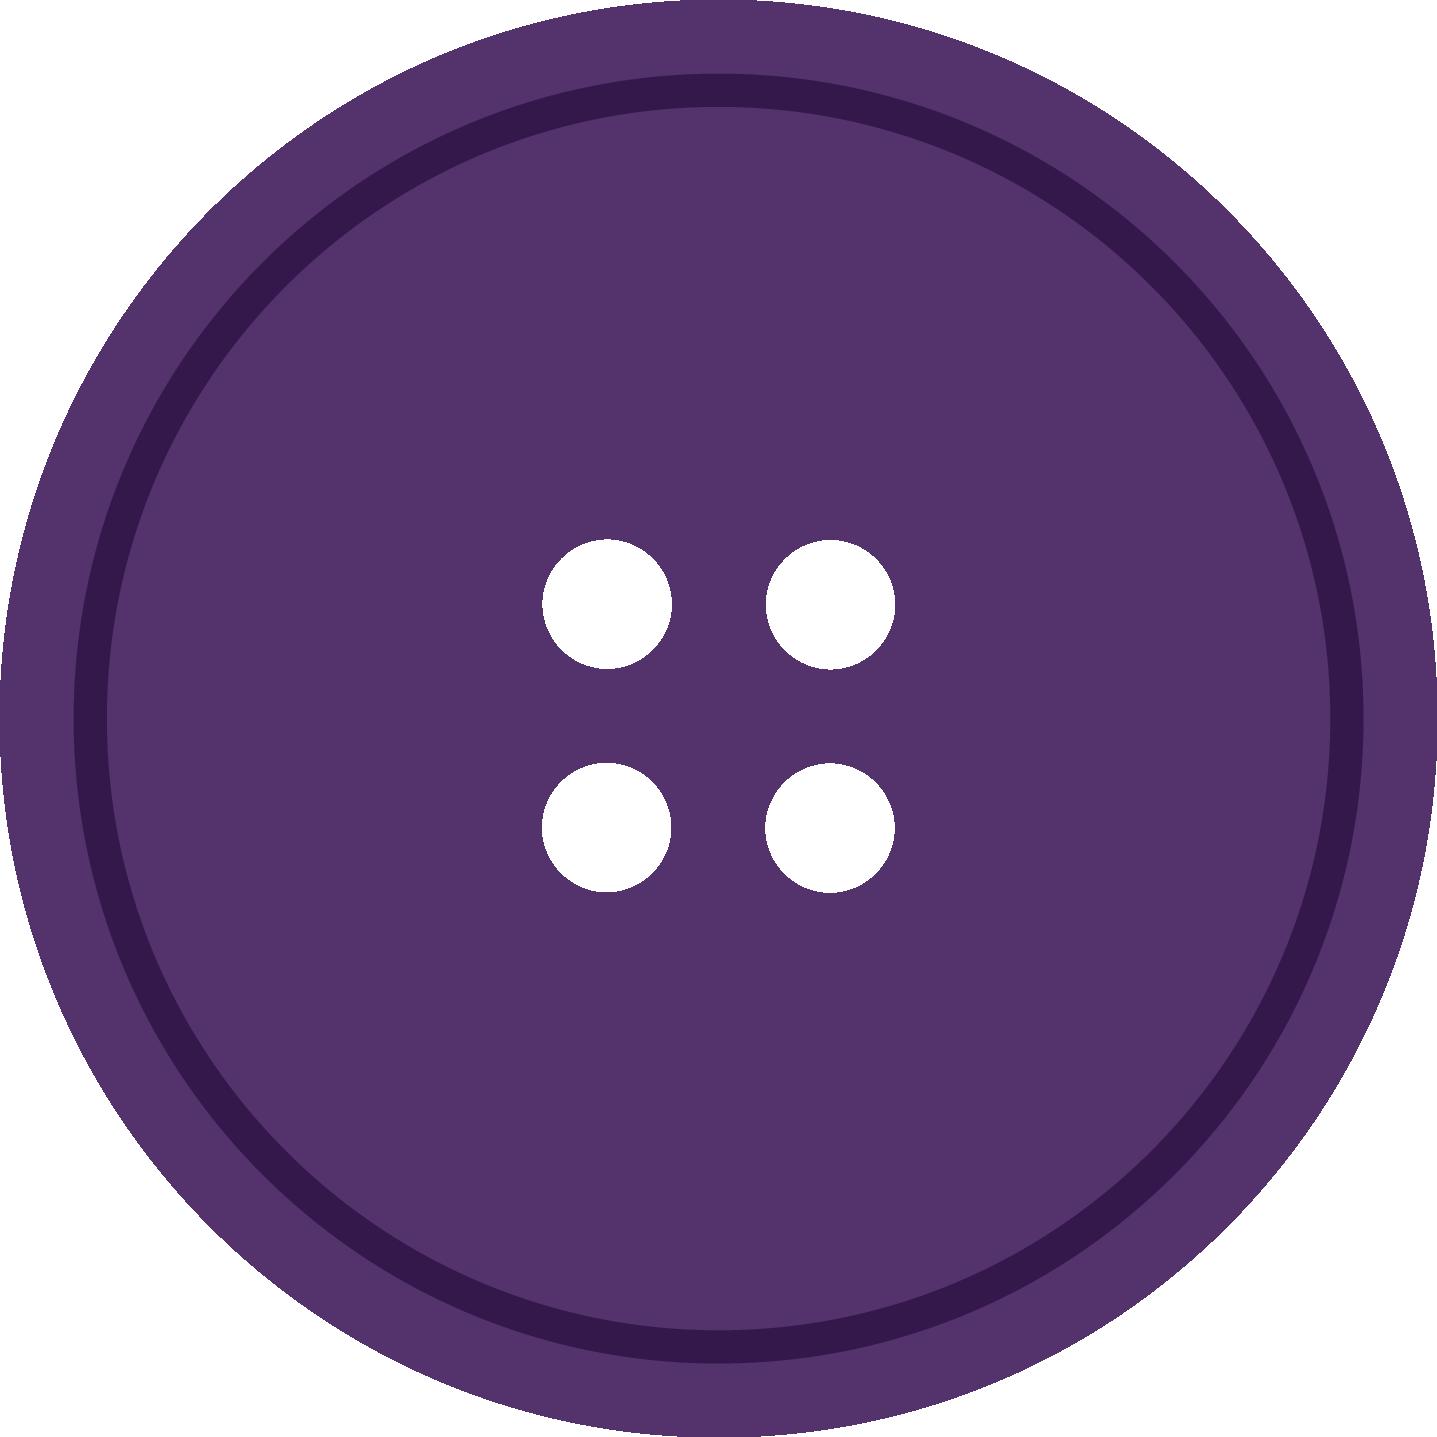 Button Clipart Png.